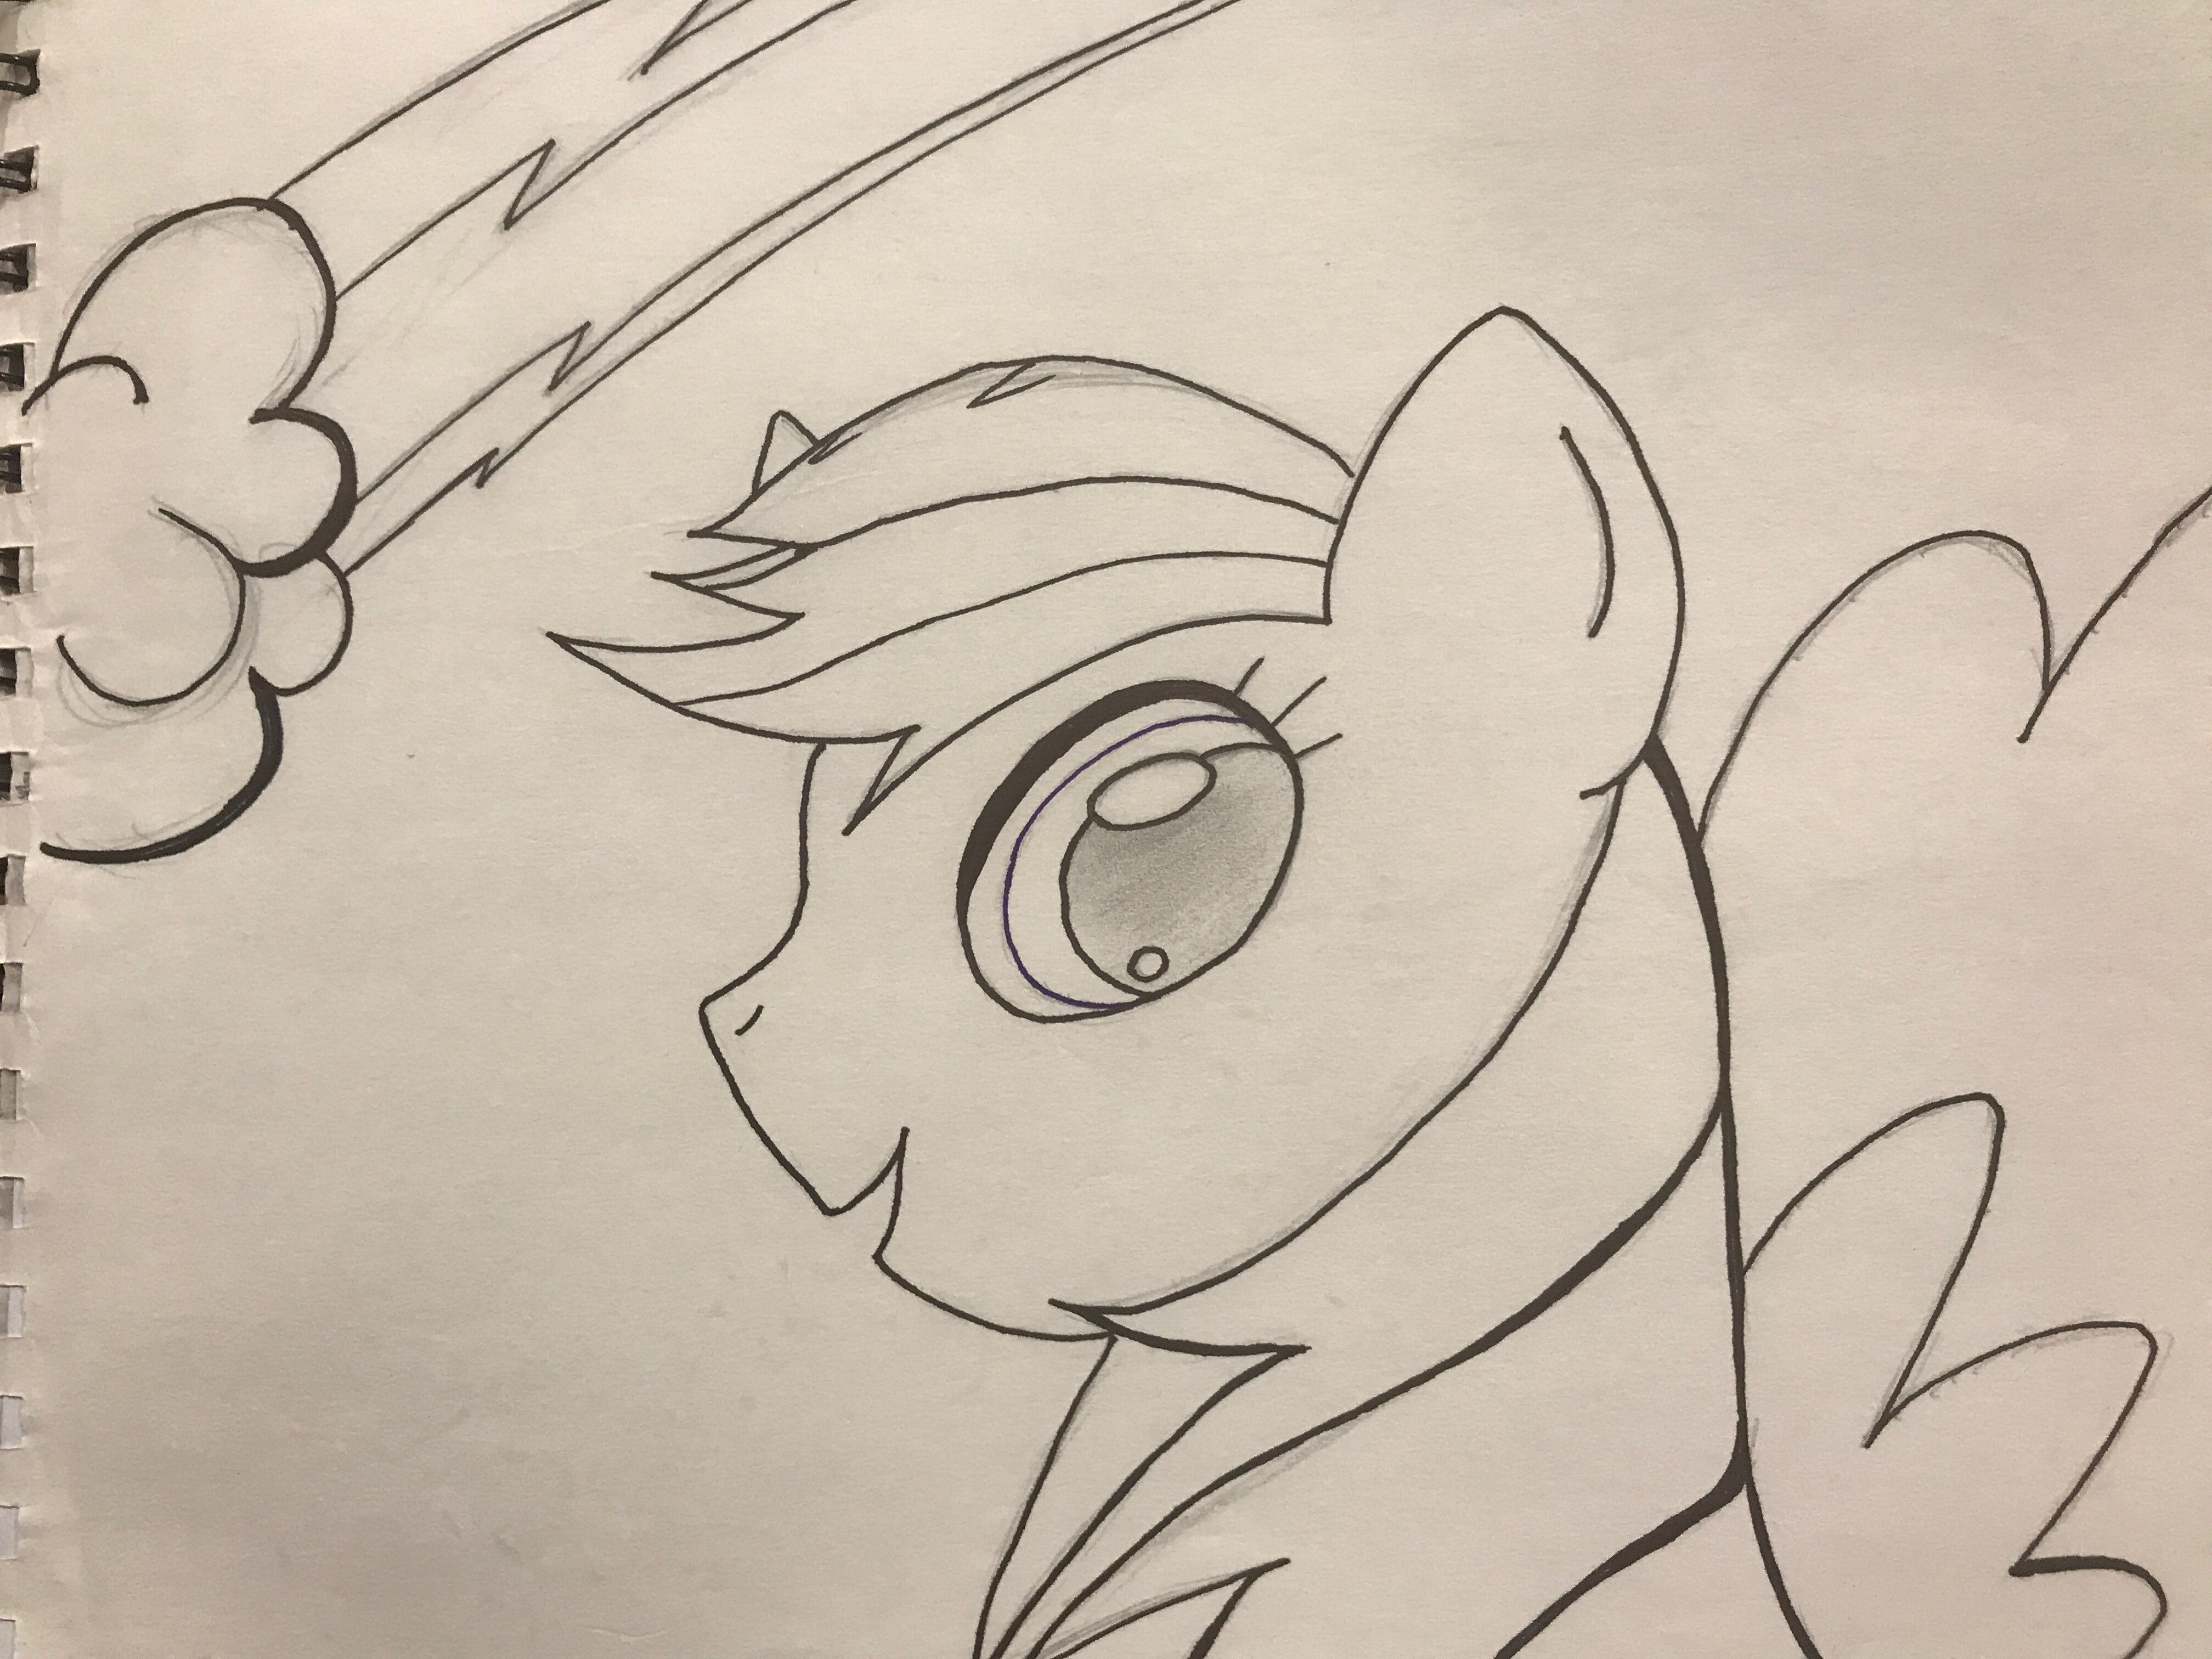 4032x3024 Rainbow Dash My Little Pony Image Found Off Of Internet. Pencil